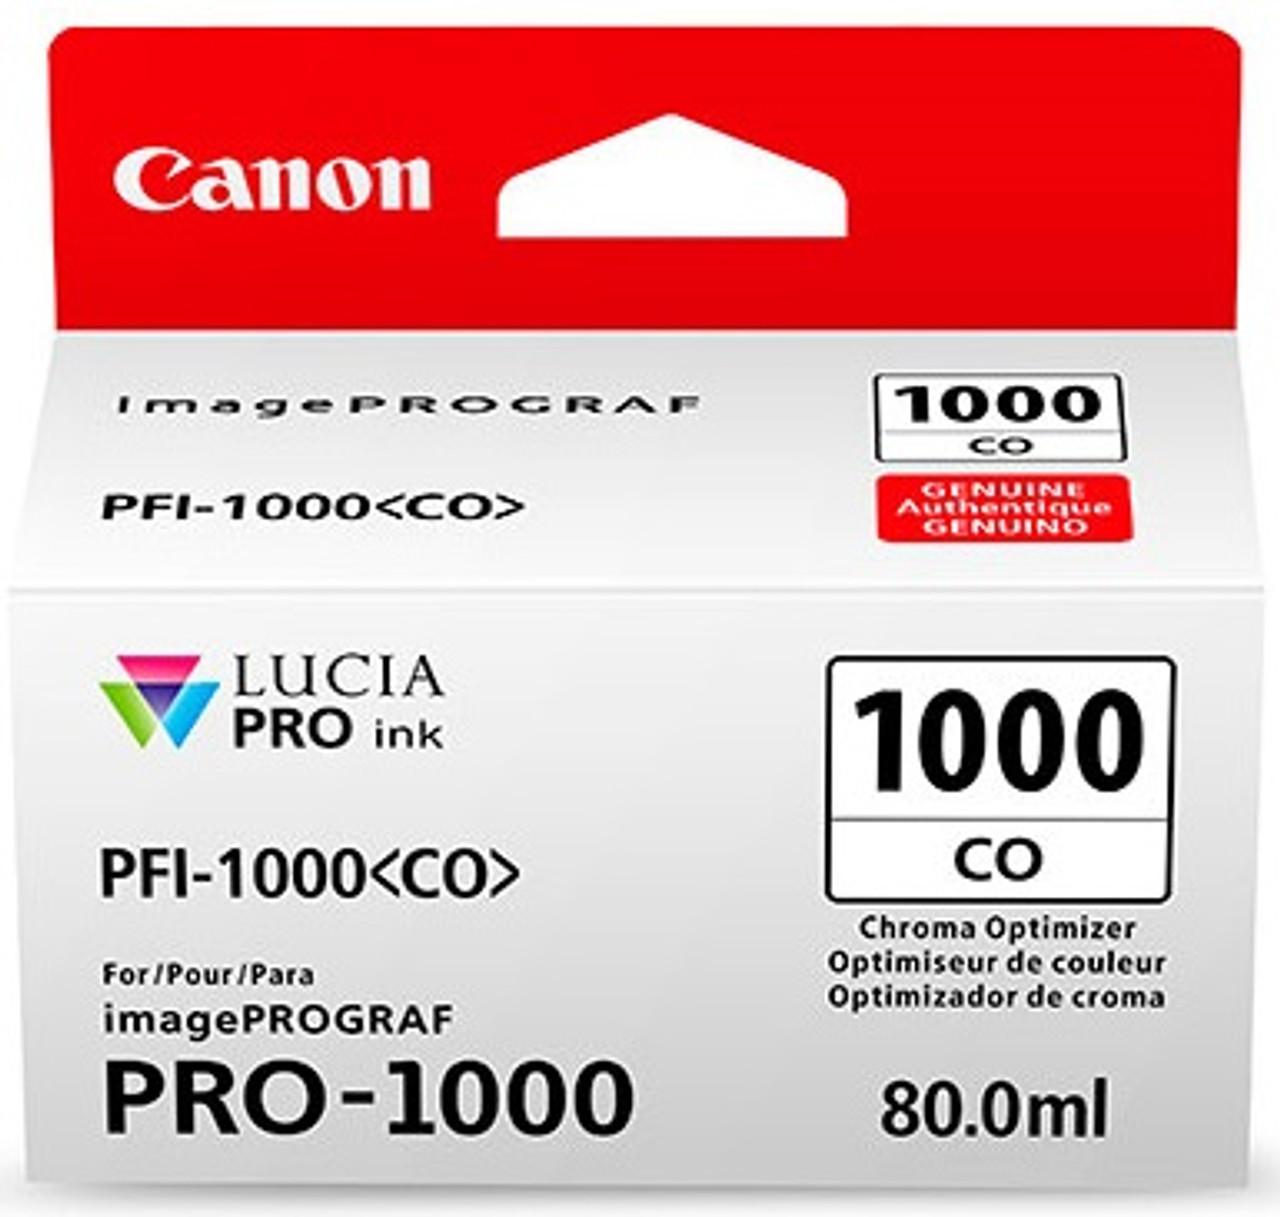 Canon PFI-1000 Chroma Optimizer Ink Tank